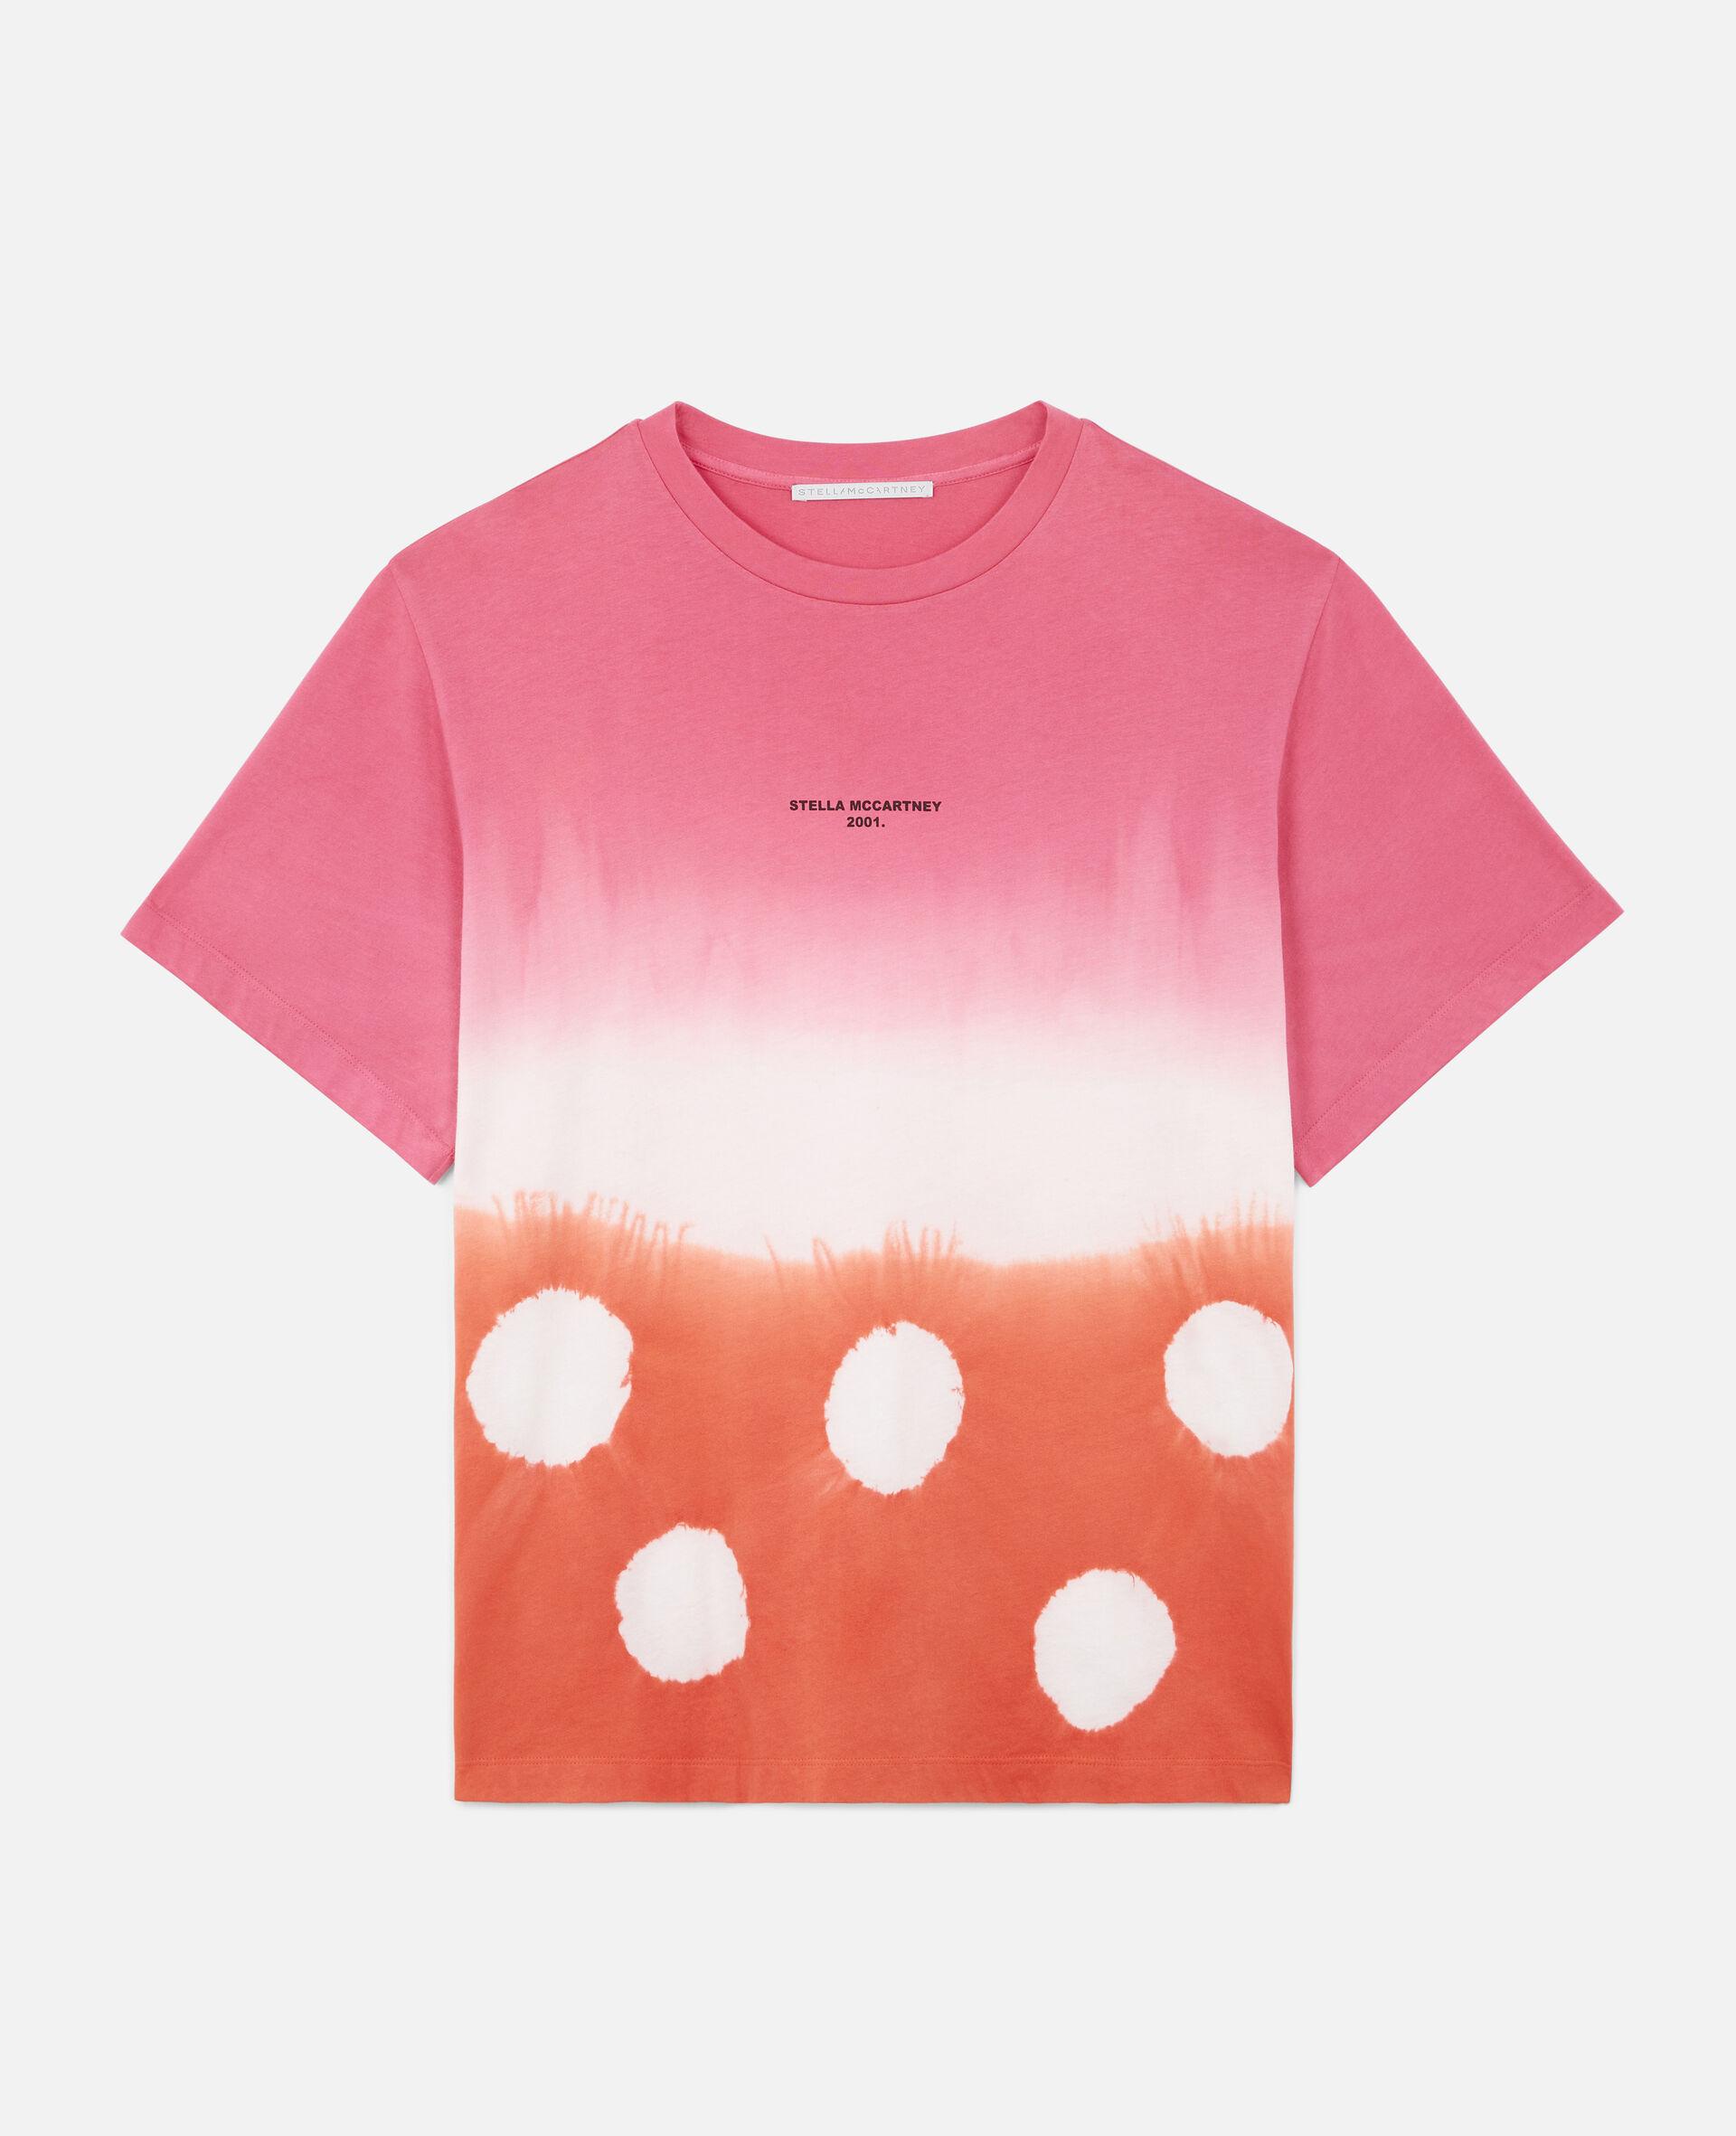 'Stella McCartney 2001.' Tie-Dye T-Shirt-Multicolour-large image number 0